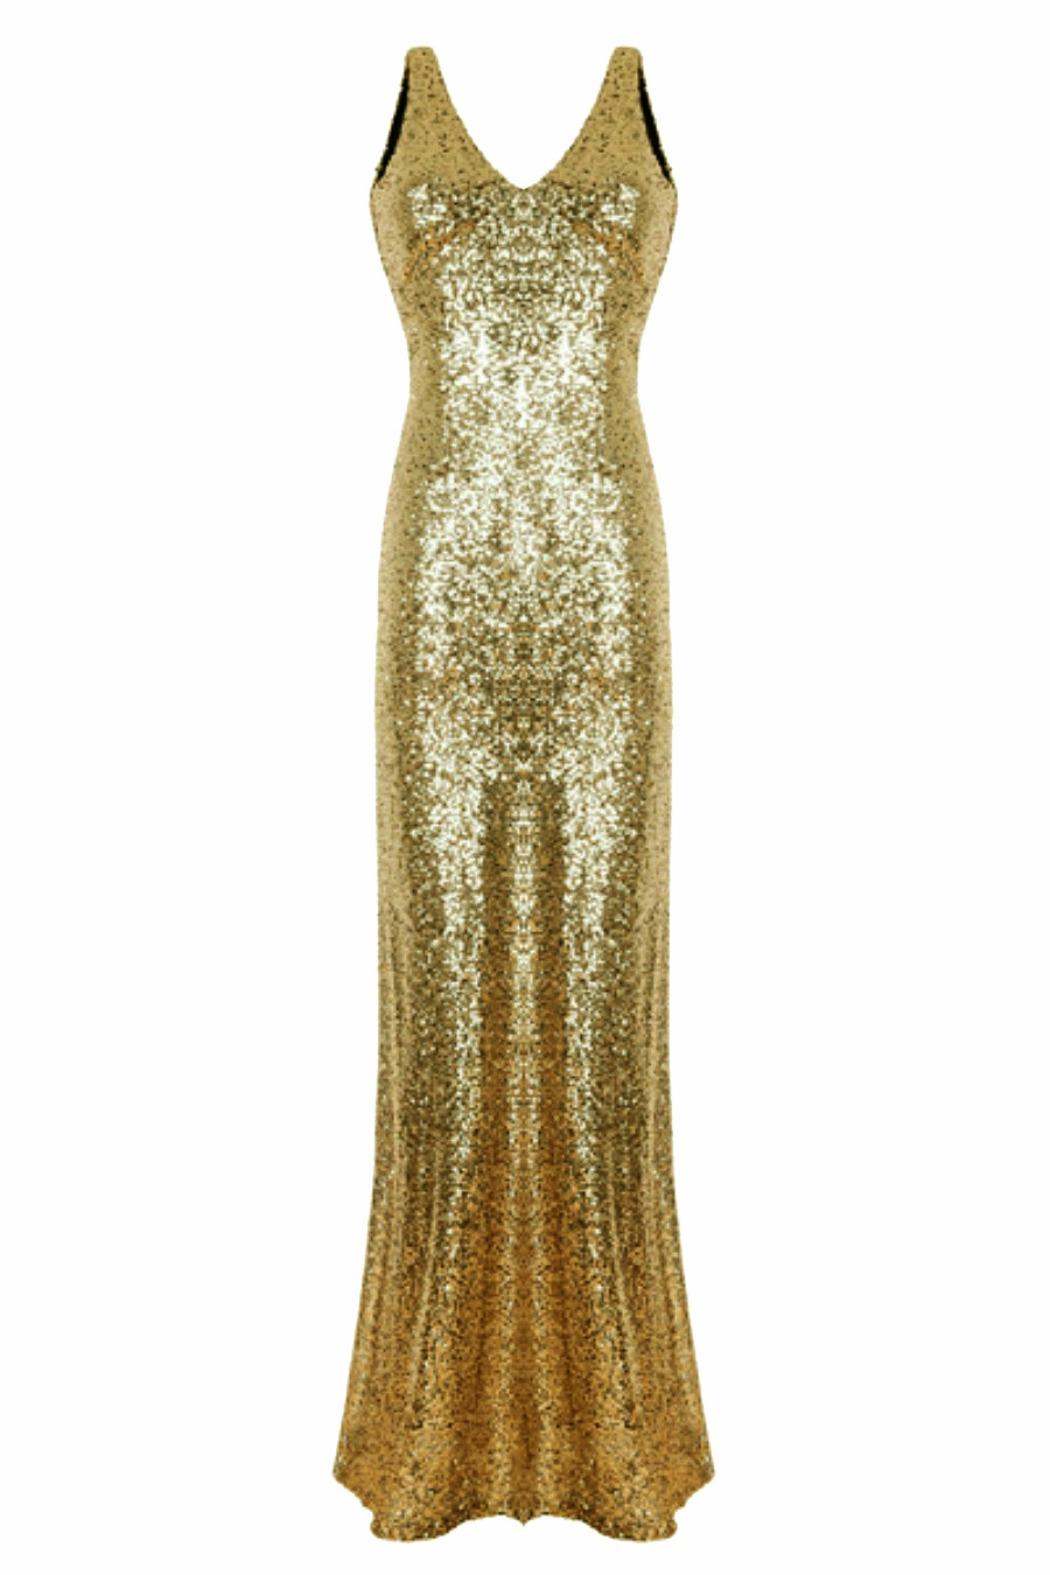 Gold Sequin Fishtail Maxi Dress